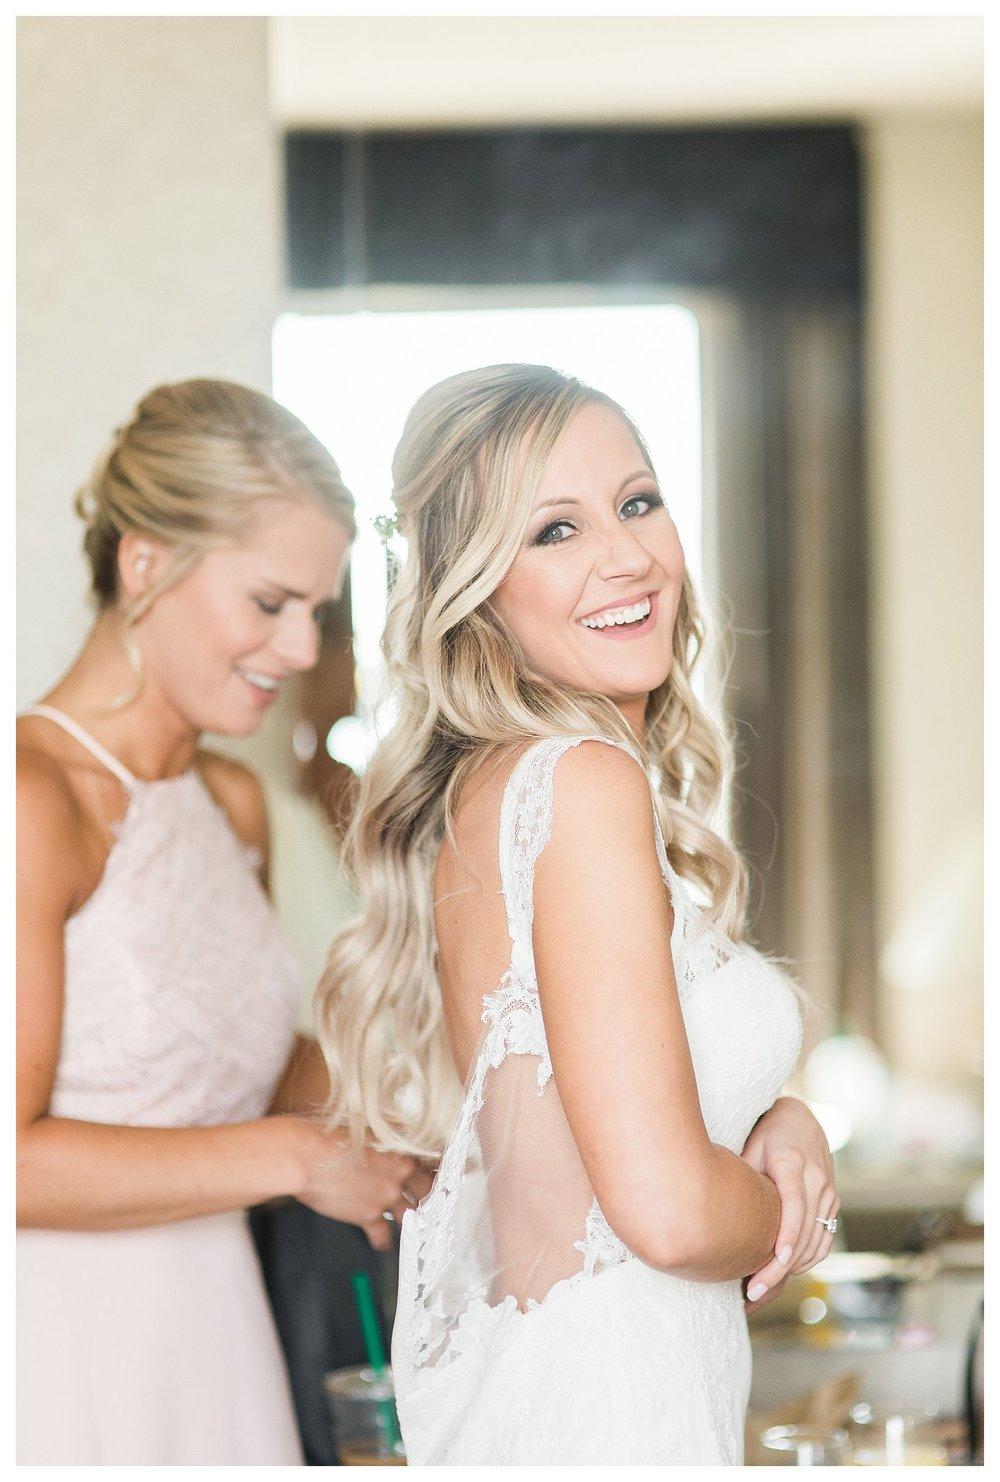 rhinegeist-wedding-everleigh-photography-cincinnati-wedding-photographer-the-singhoff-wedding-08